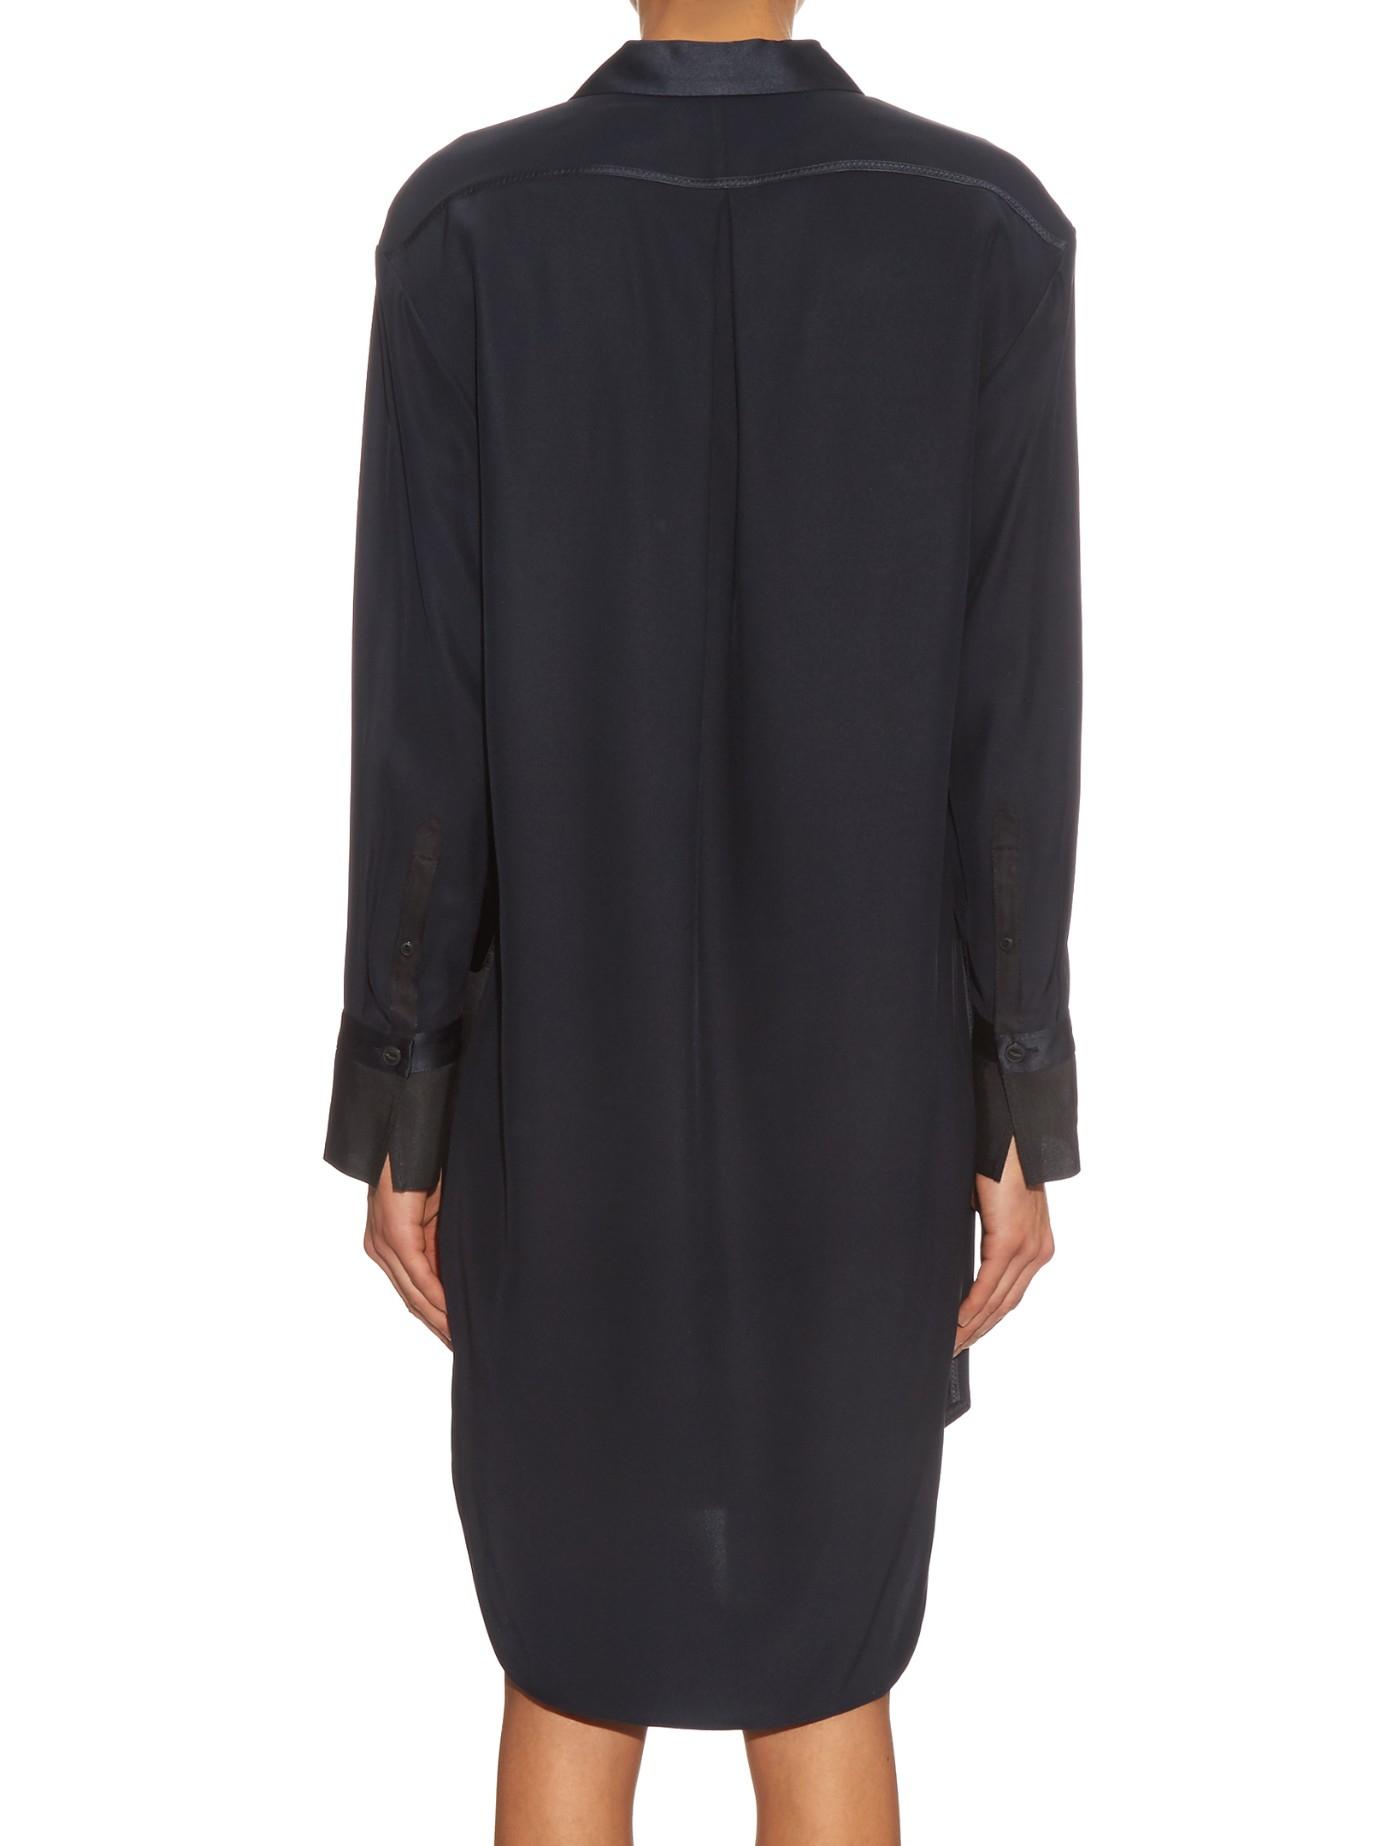 Outlet Official Site Outlet Footlocker Rag & Bone Woman Ava Silk Shirt Dress Navy Size 2 Rag & Bone xBarI52YY